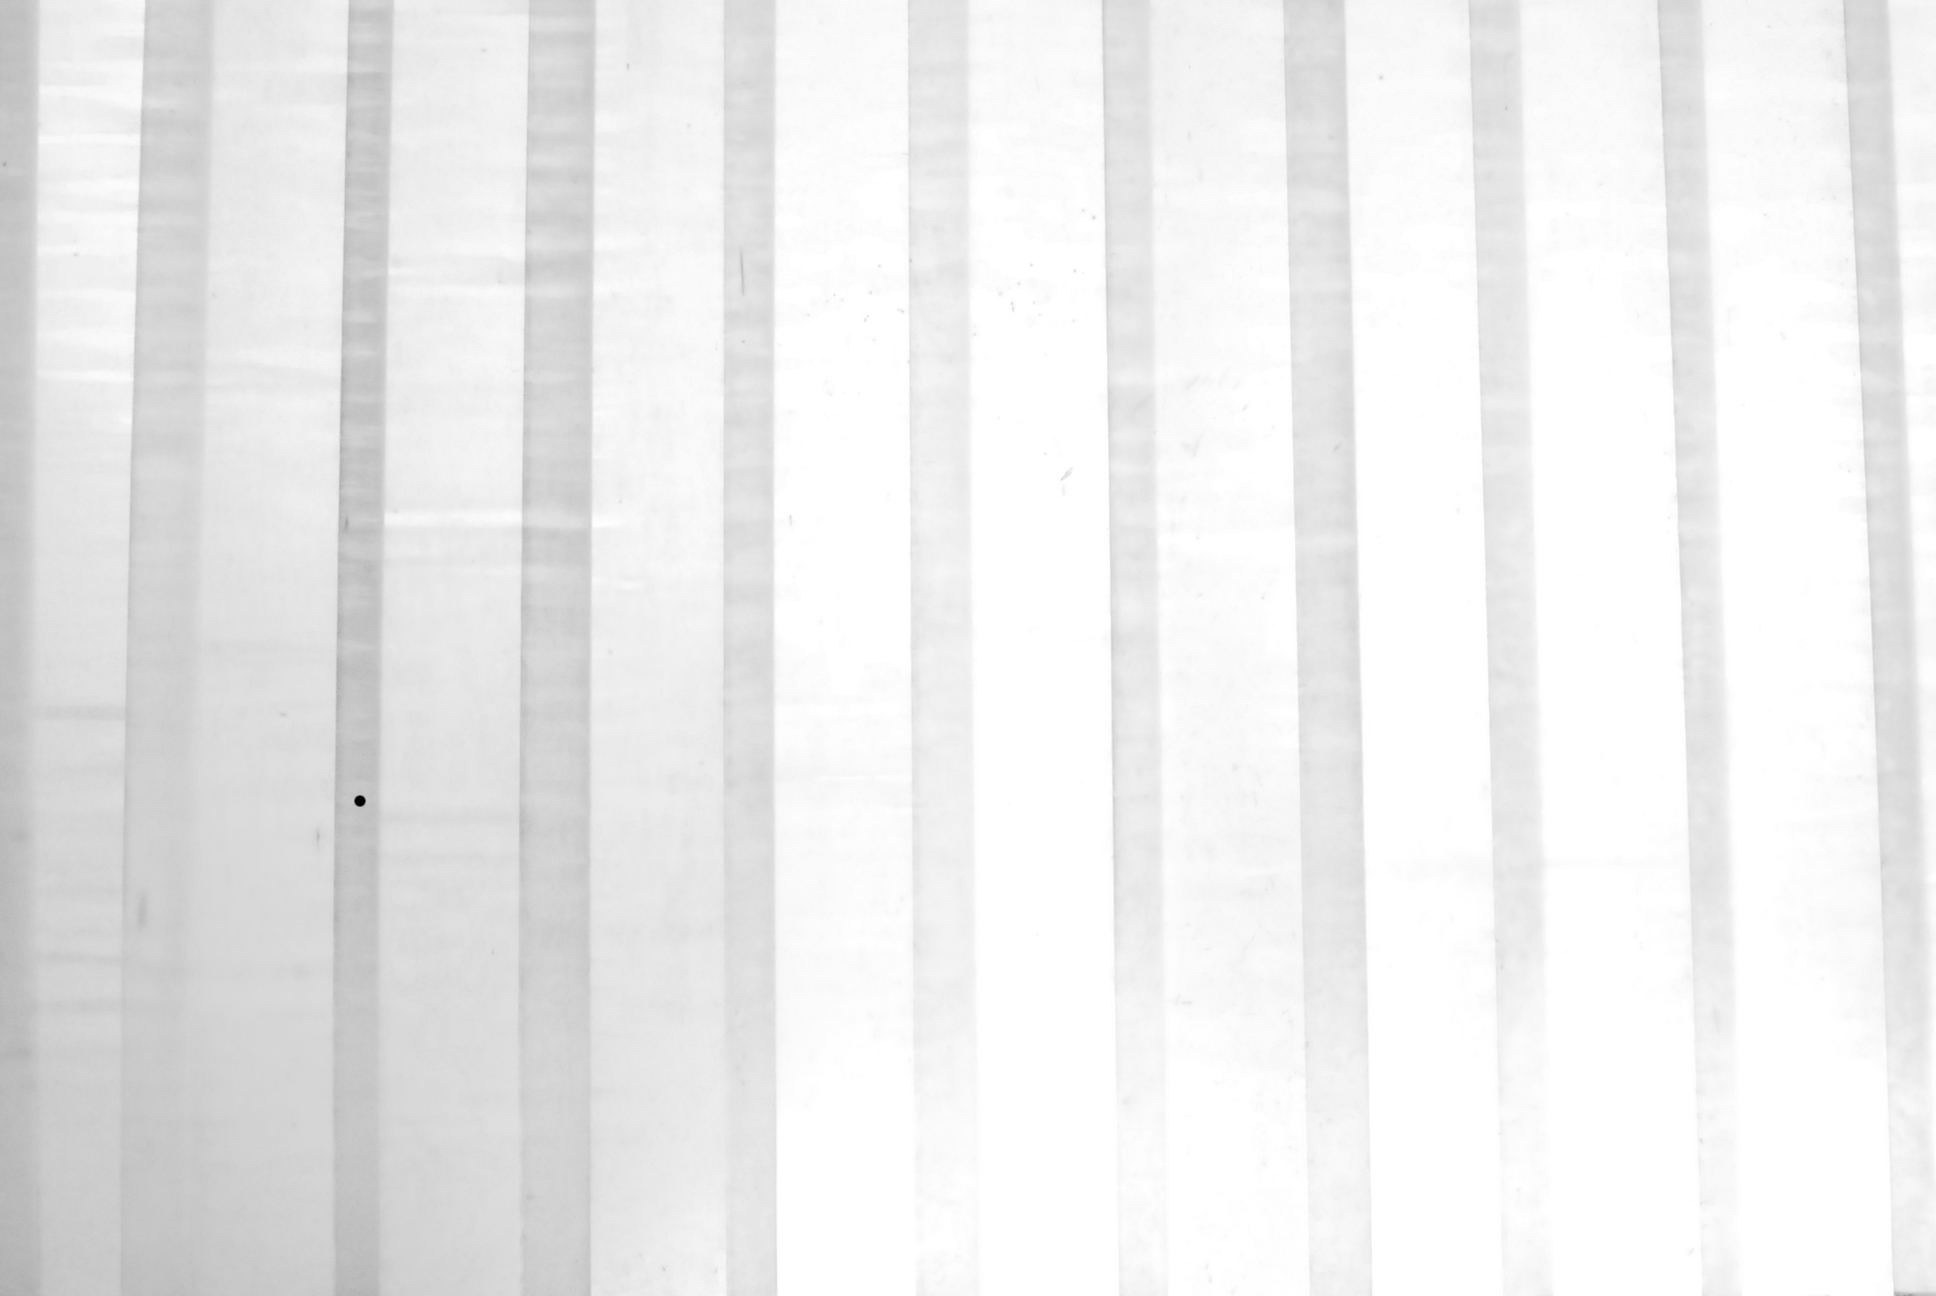 img/texturas/textura-cortina.JPG